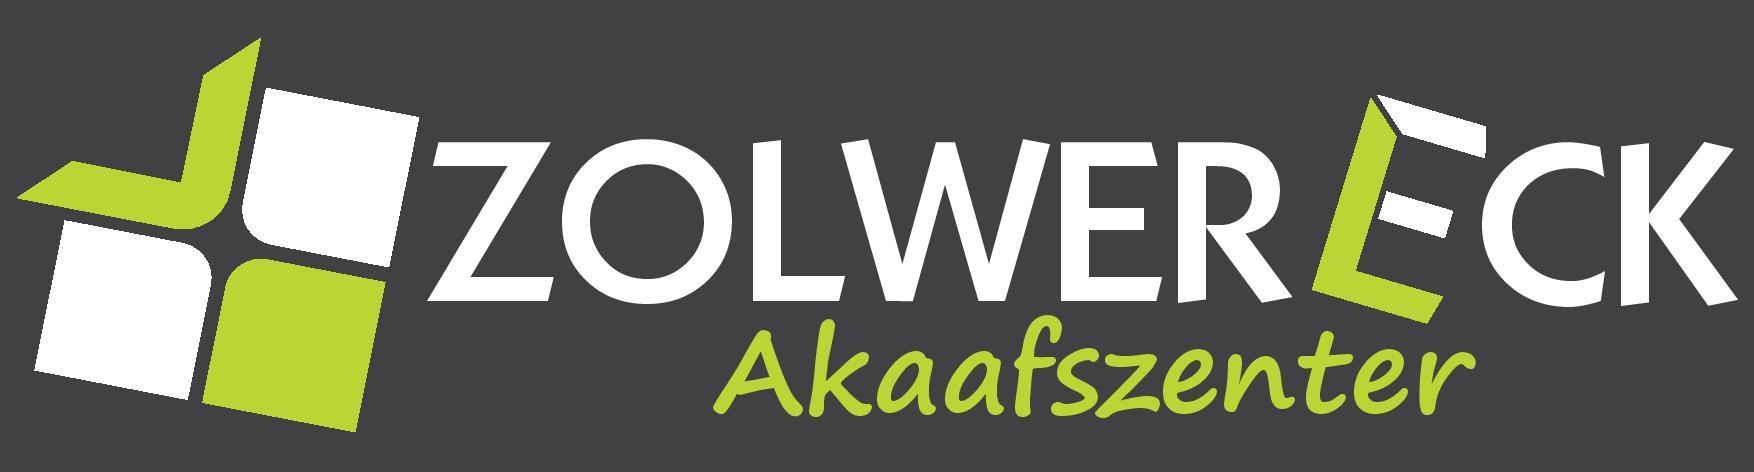 Logo-Zolwereck-gris-page-001